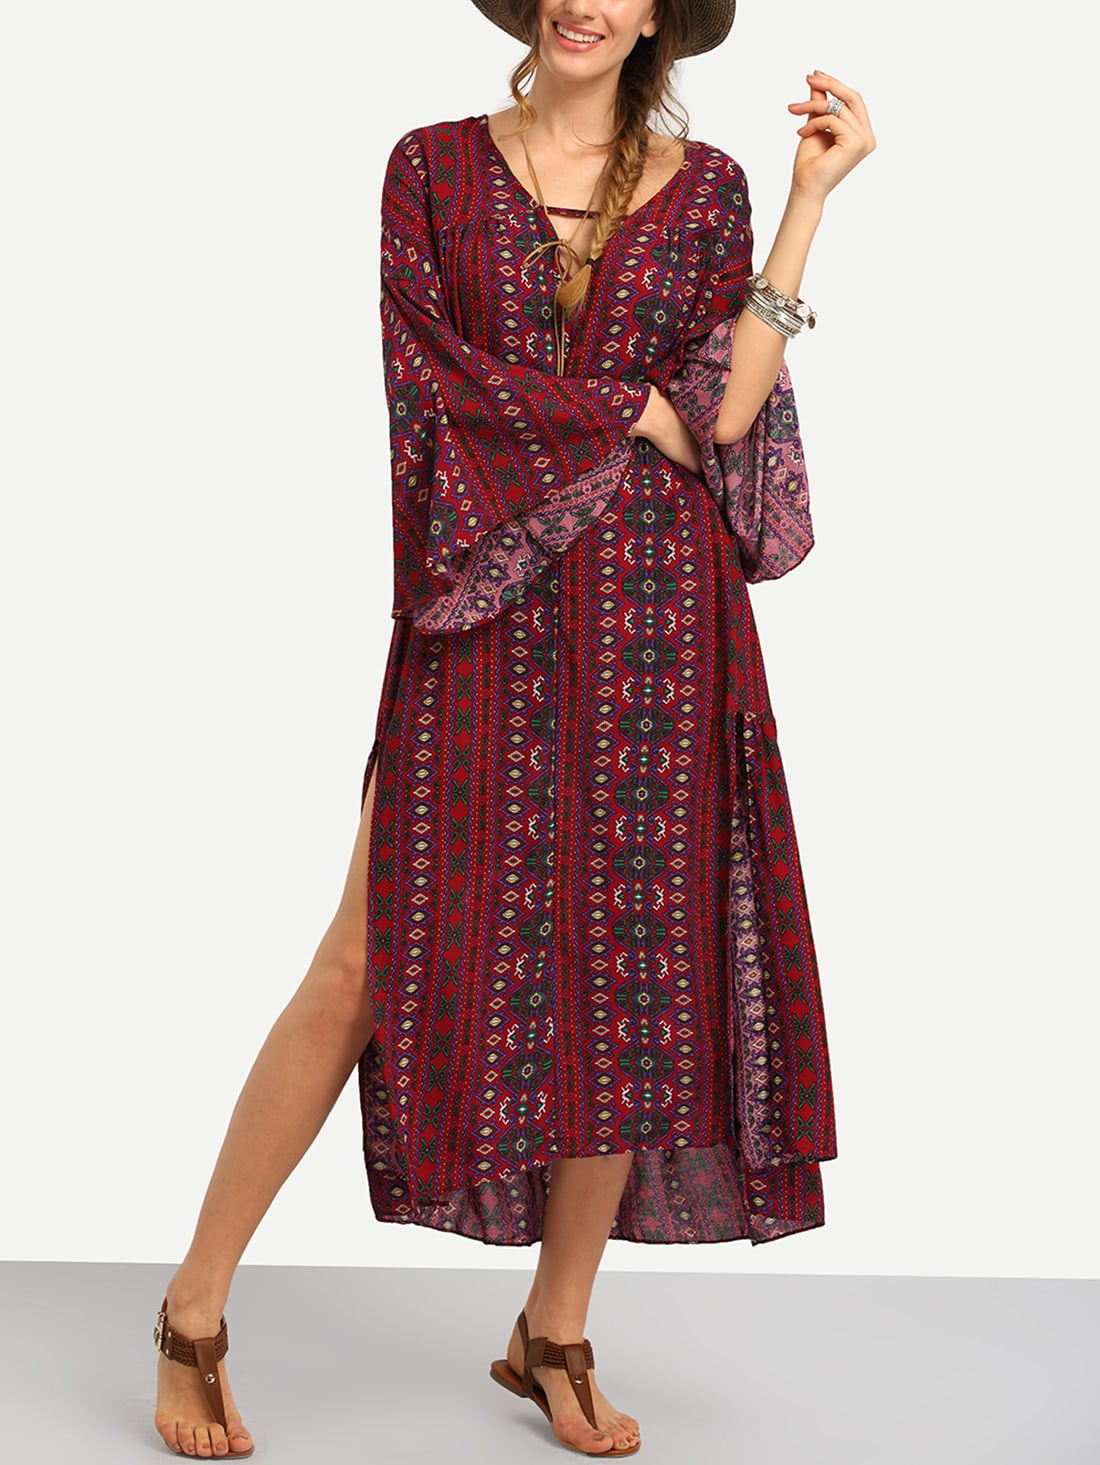 Tribal Print Slit Side Long Dress dress160420103